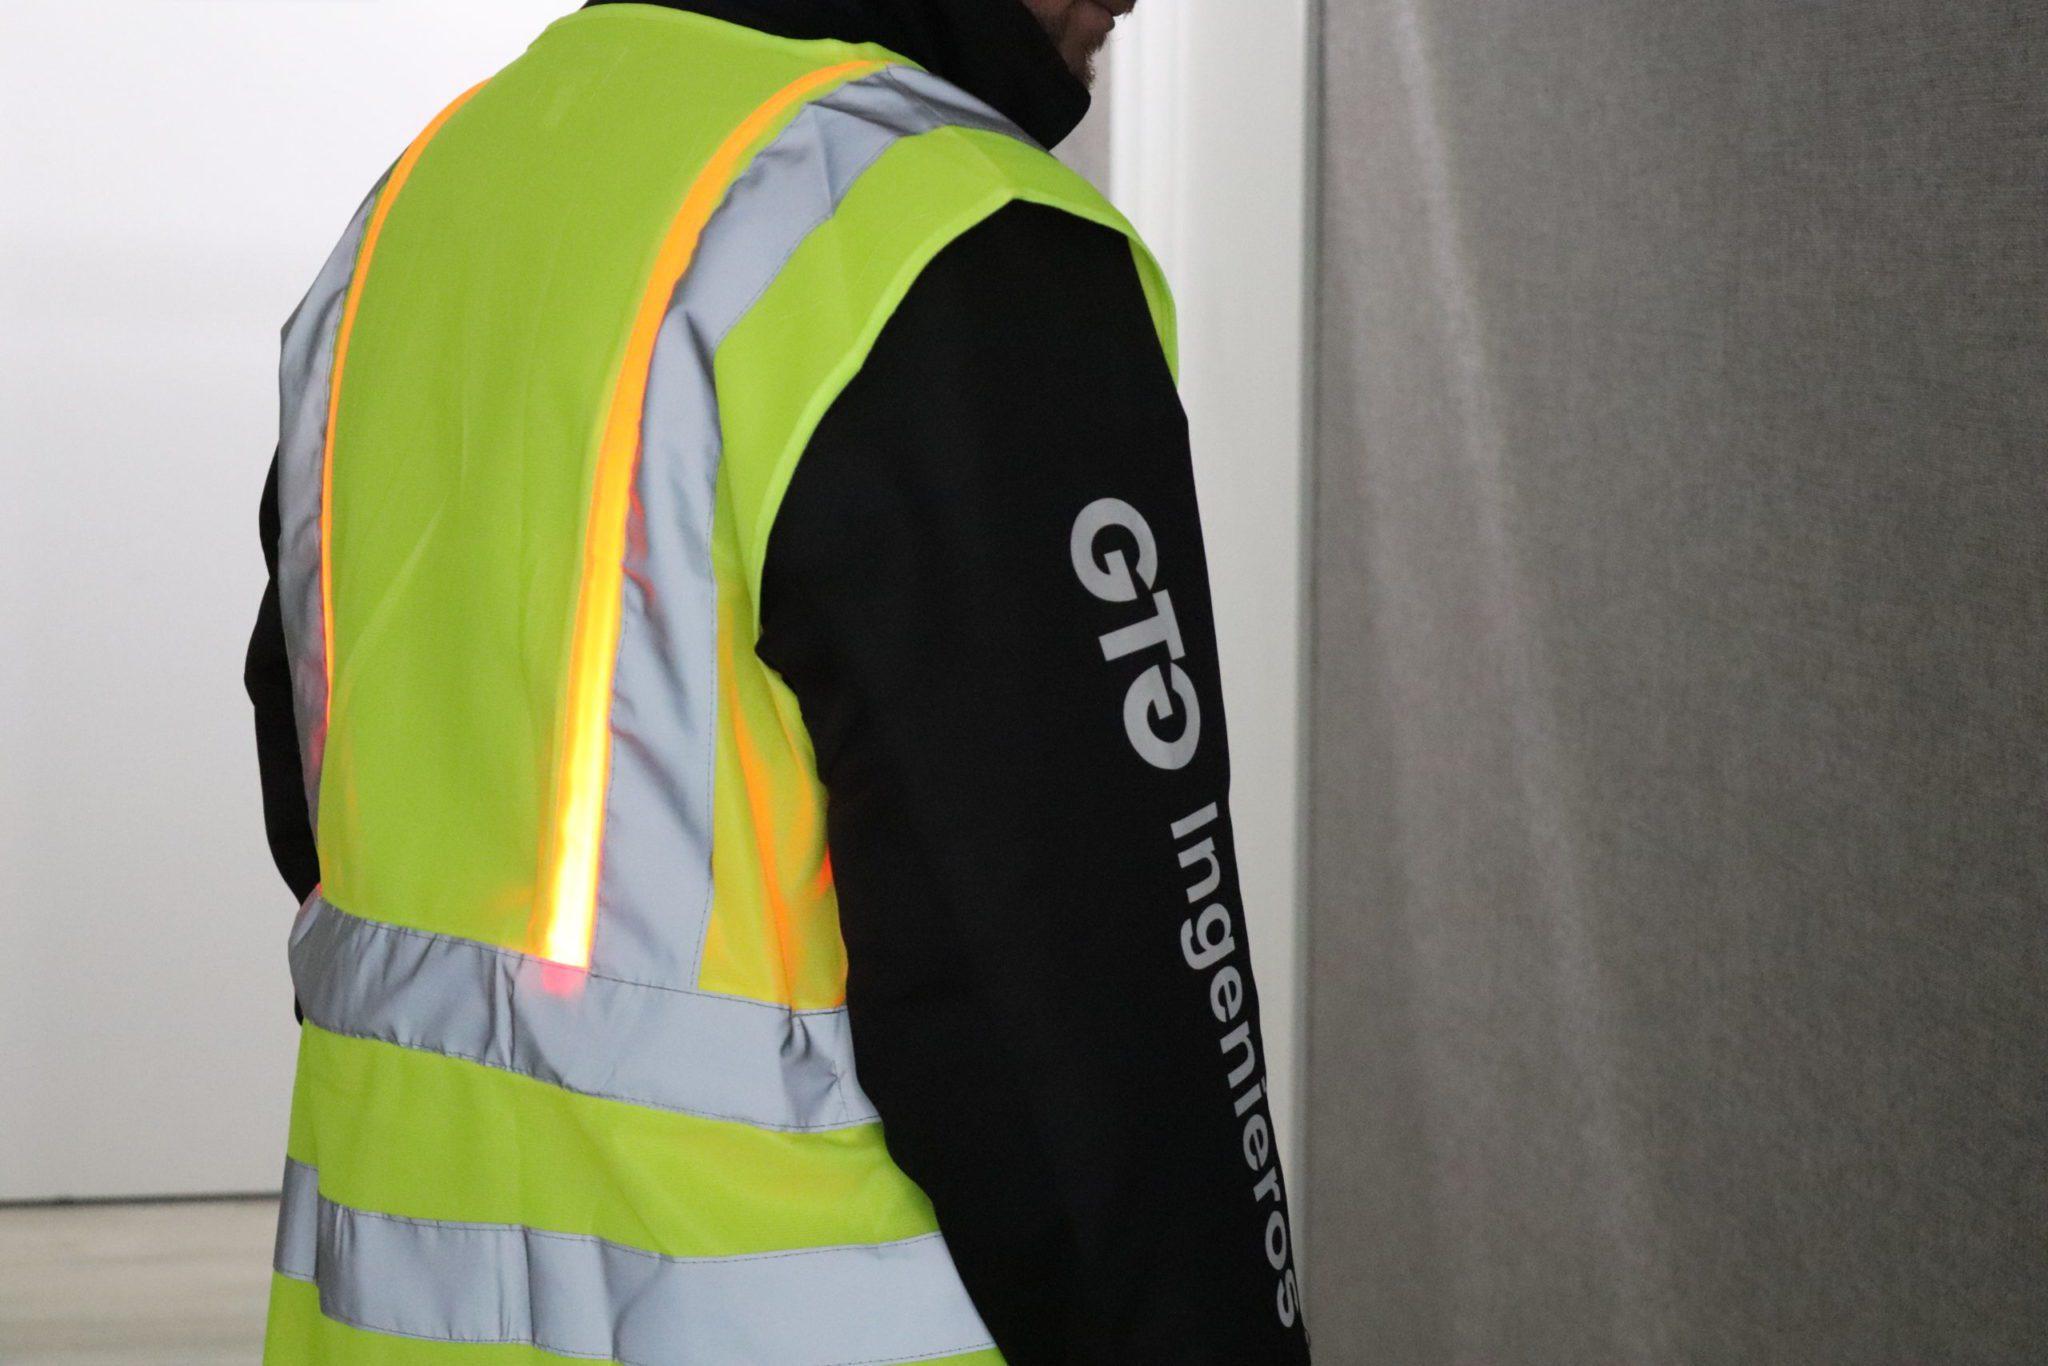 CLAP Chaleco LED de alta visibilidad